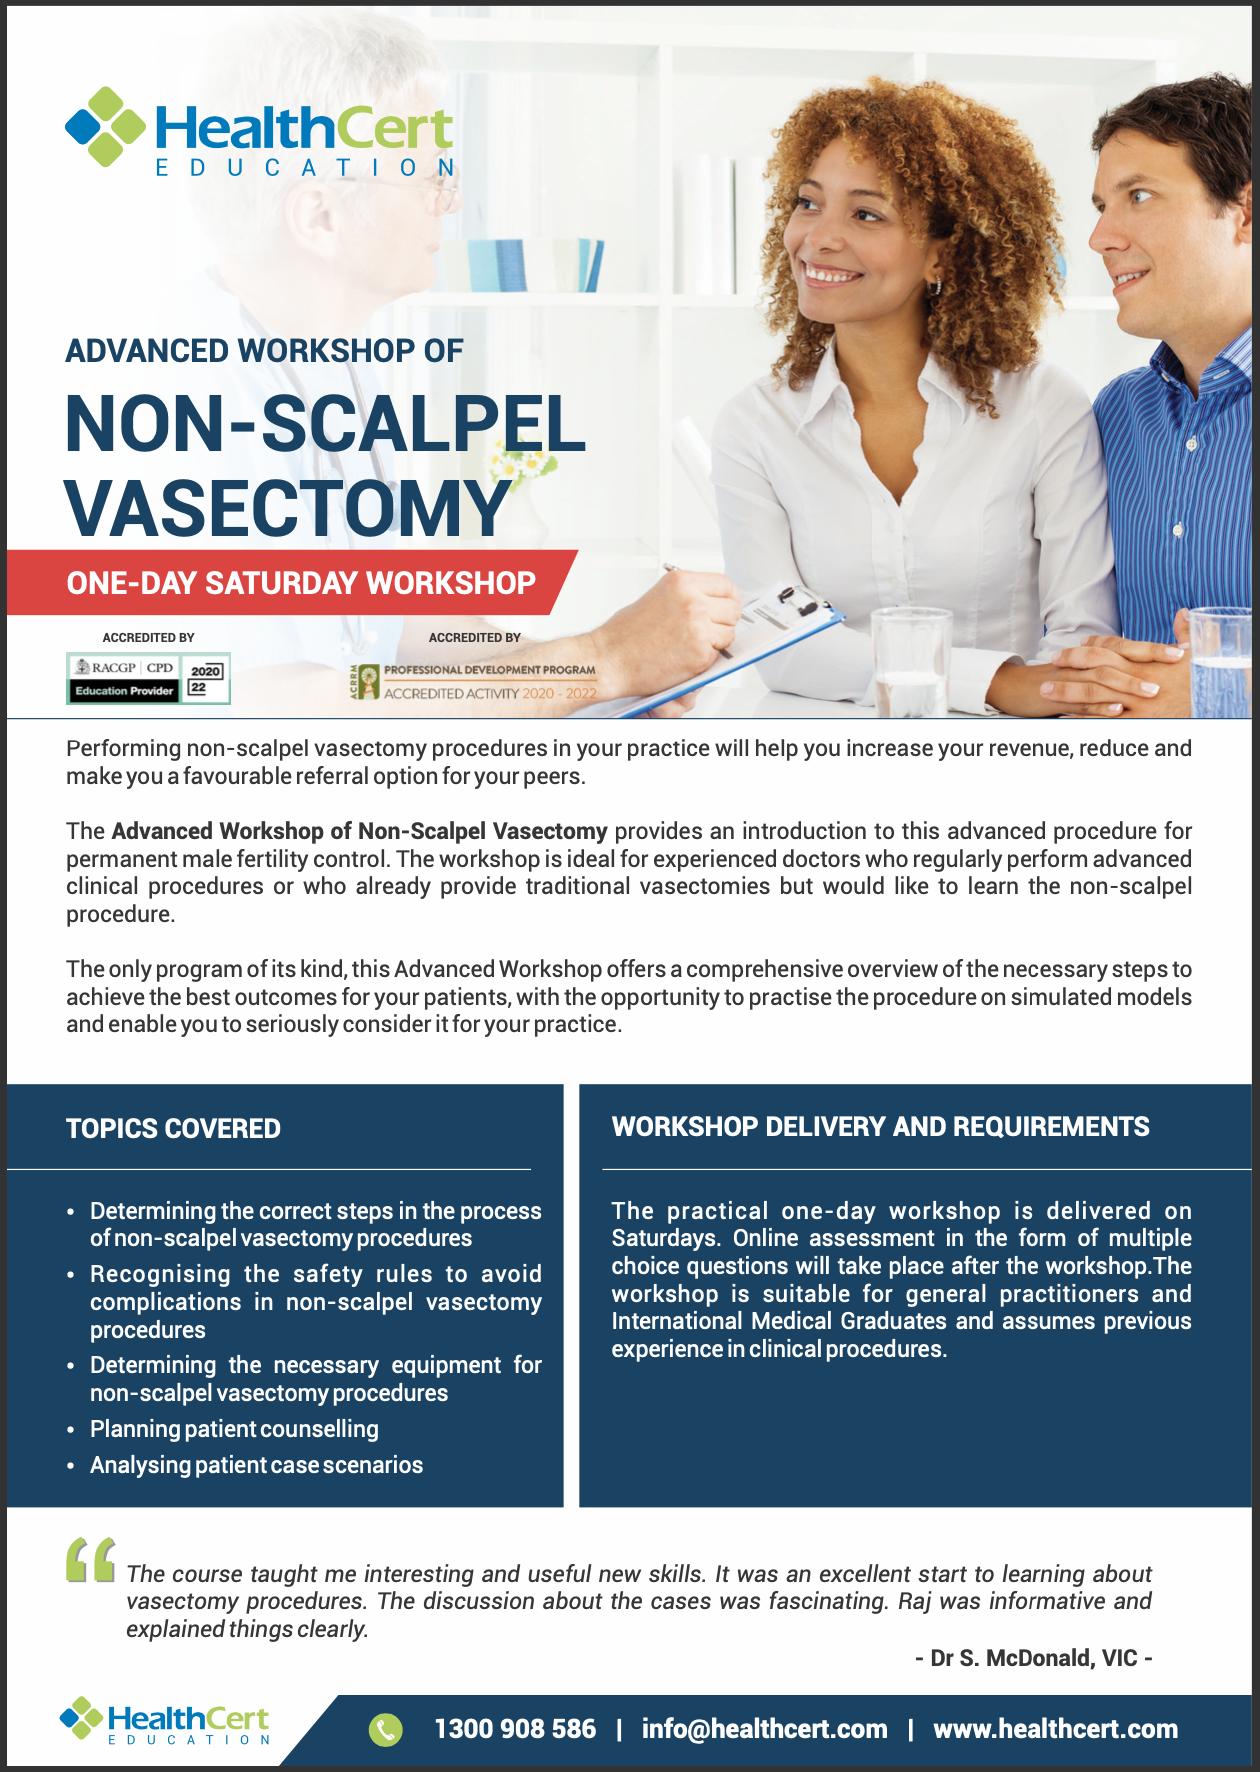 Advanced-Workshop-of-Non-Scalpel-Vasectomy